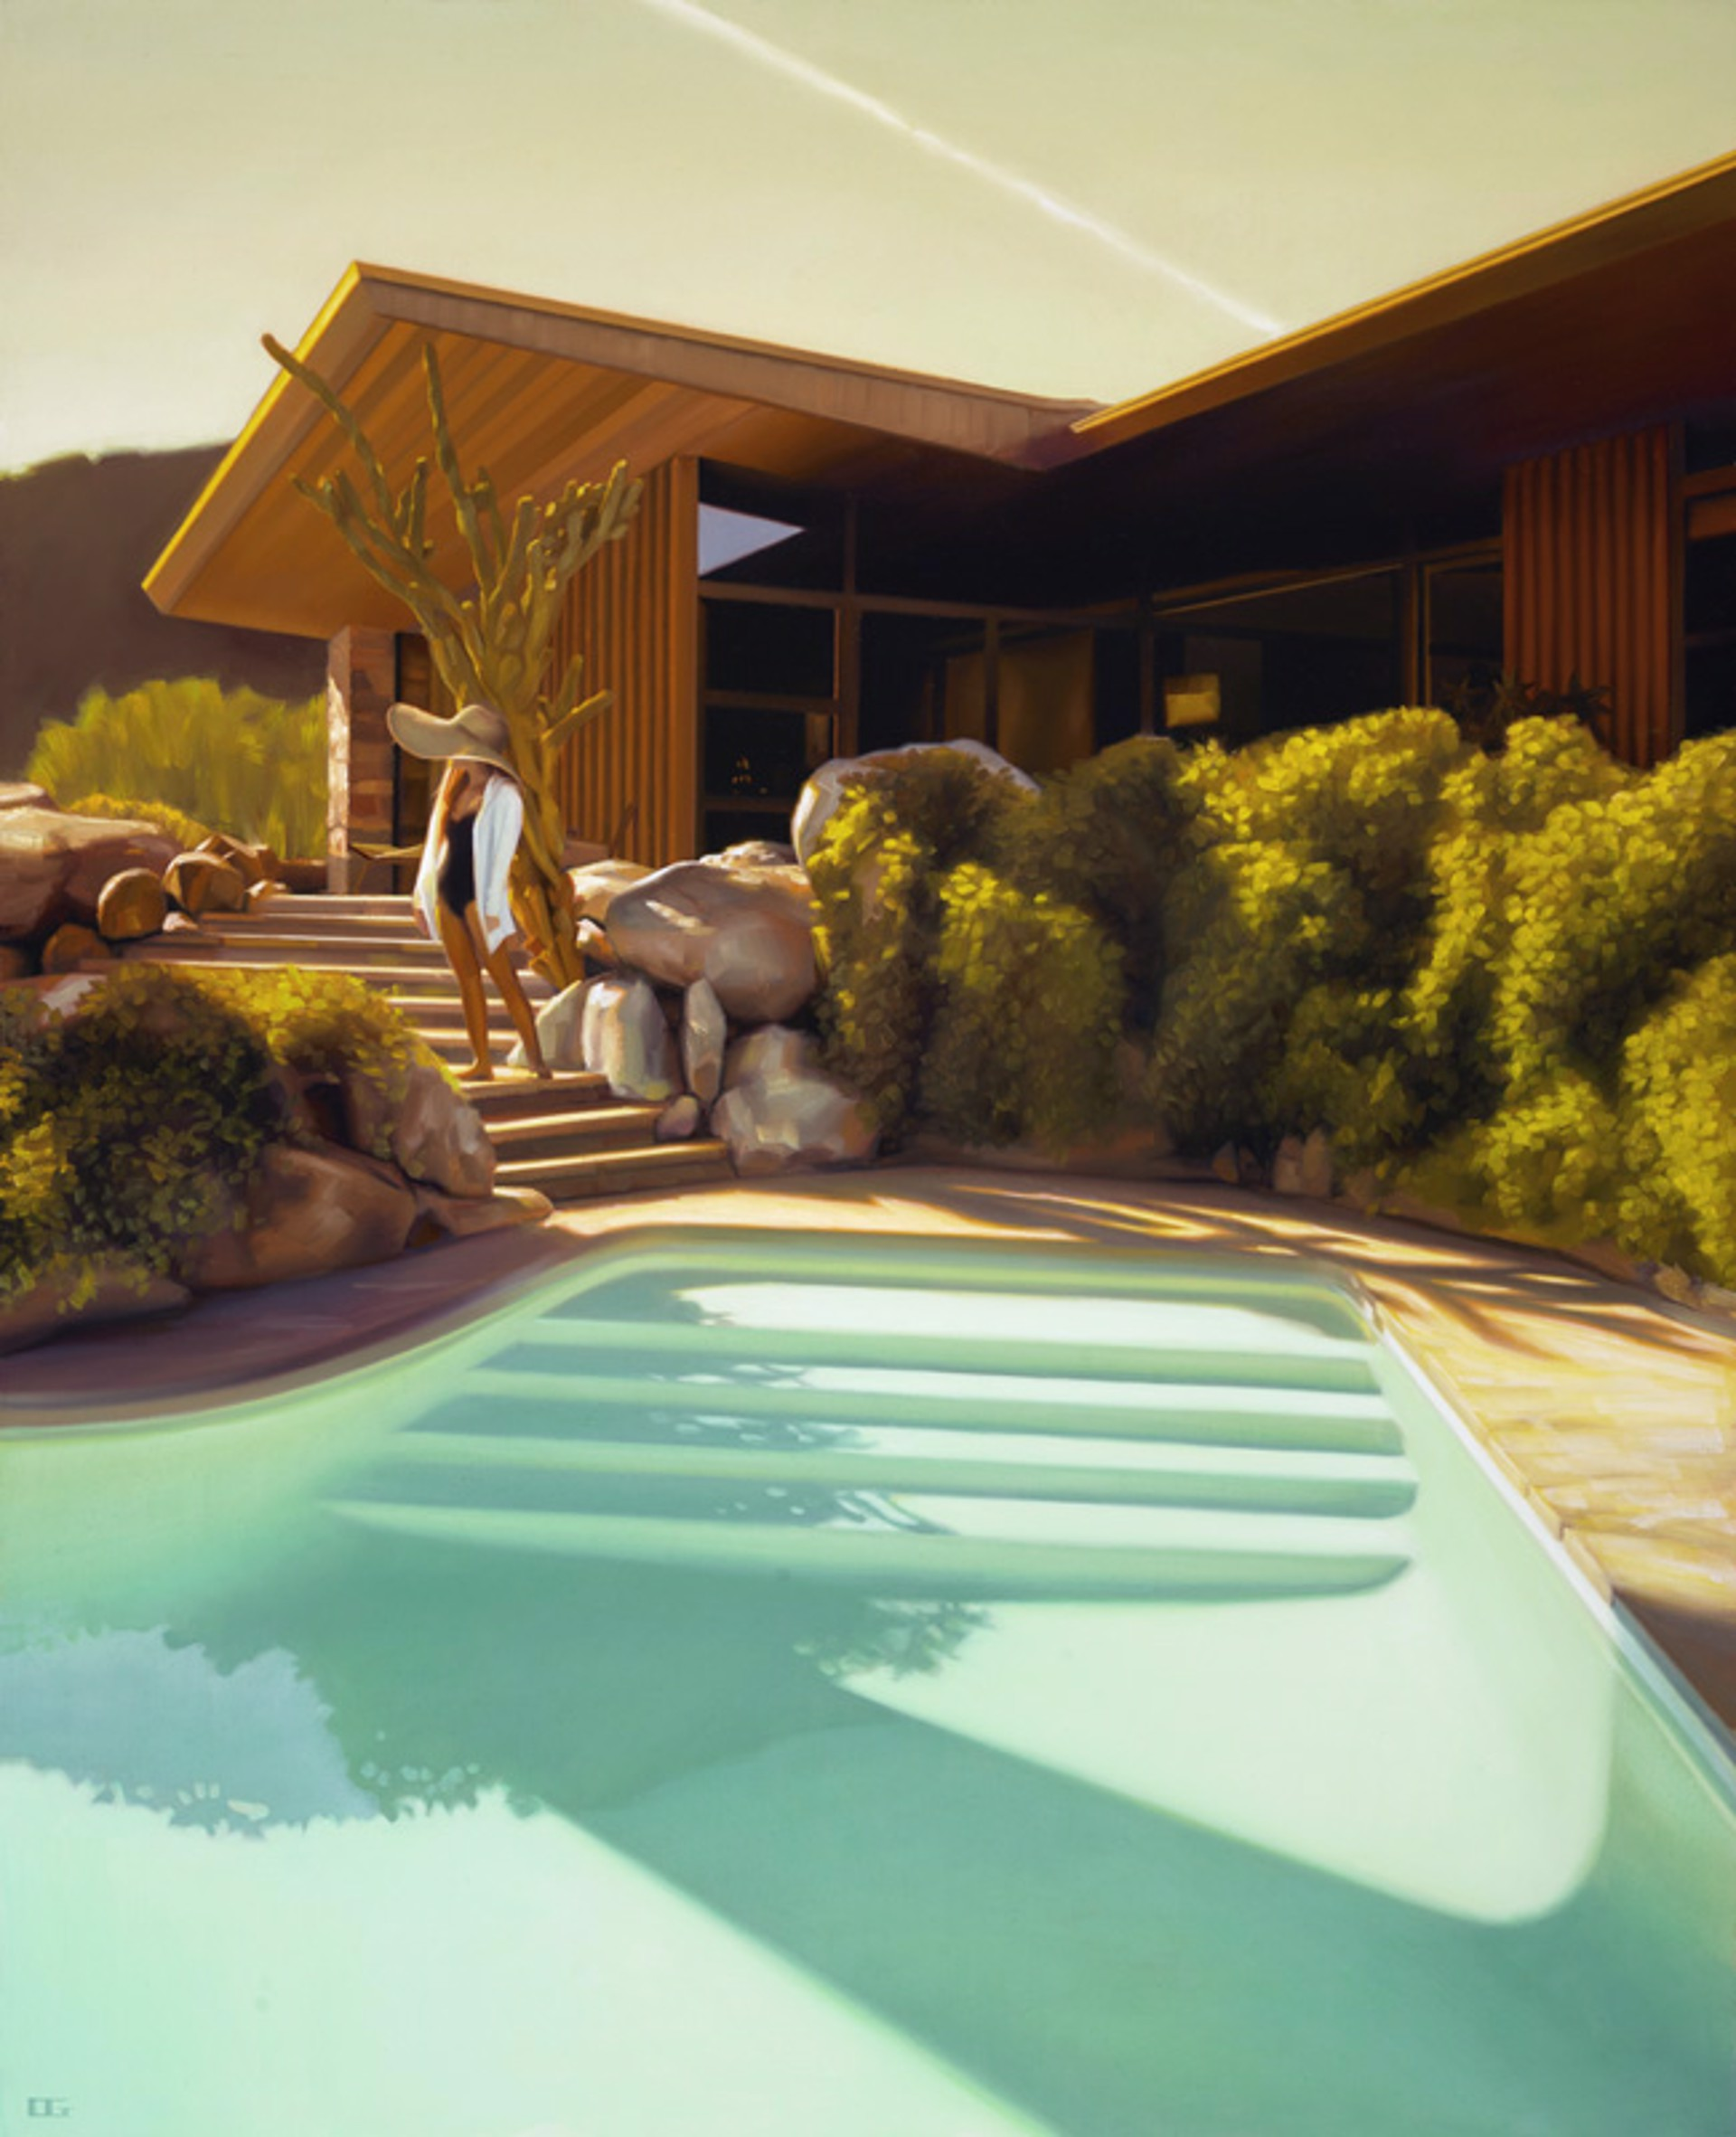 Edris House (S/N) by Carrie Graber